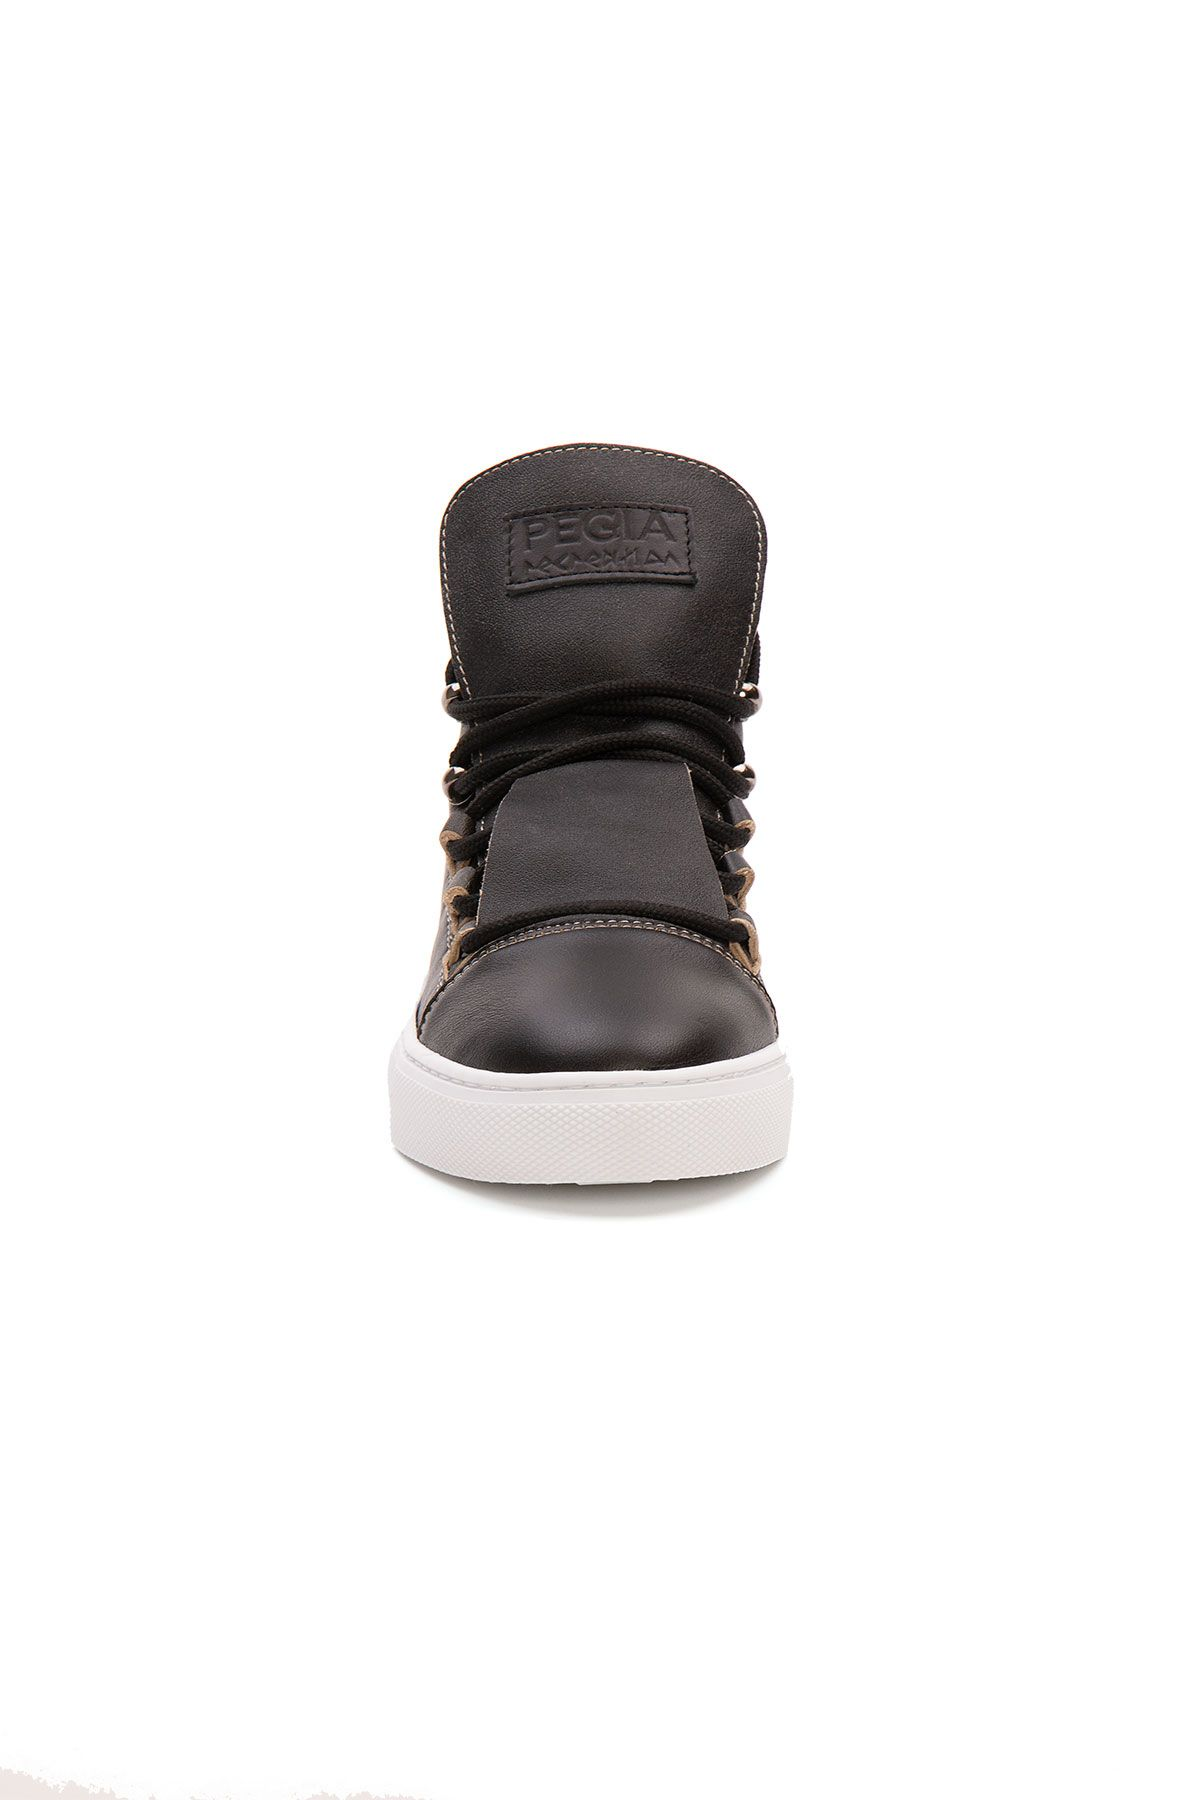 Pegia Hakiki Deri Kadın Sneaker LA1326 Siyah